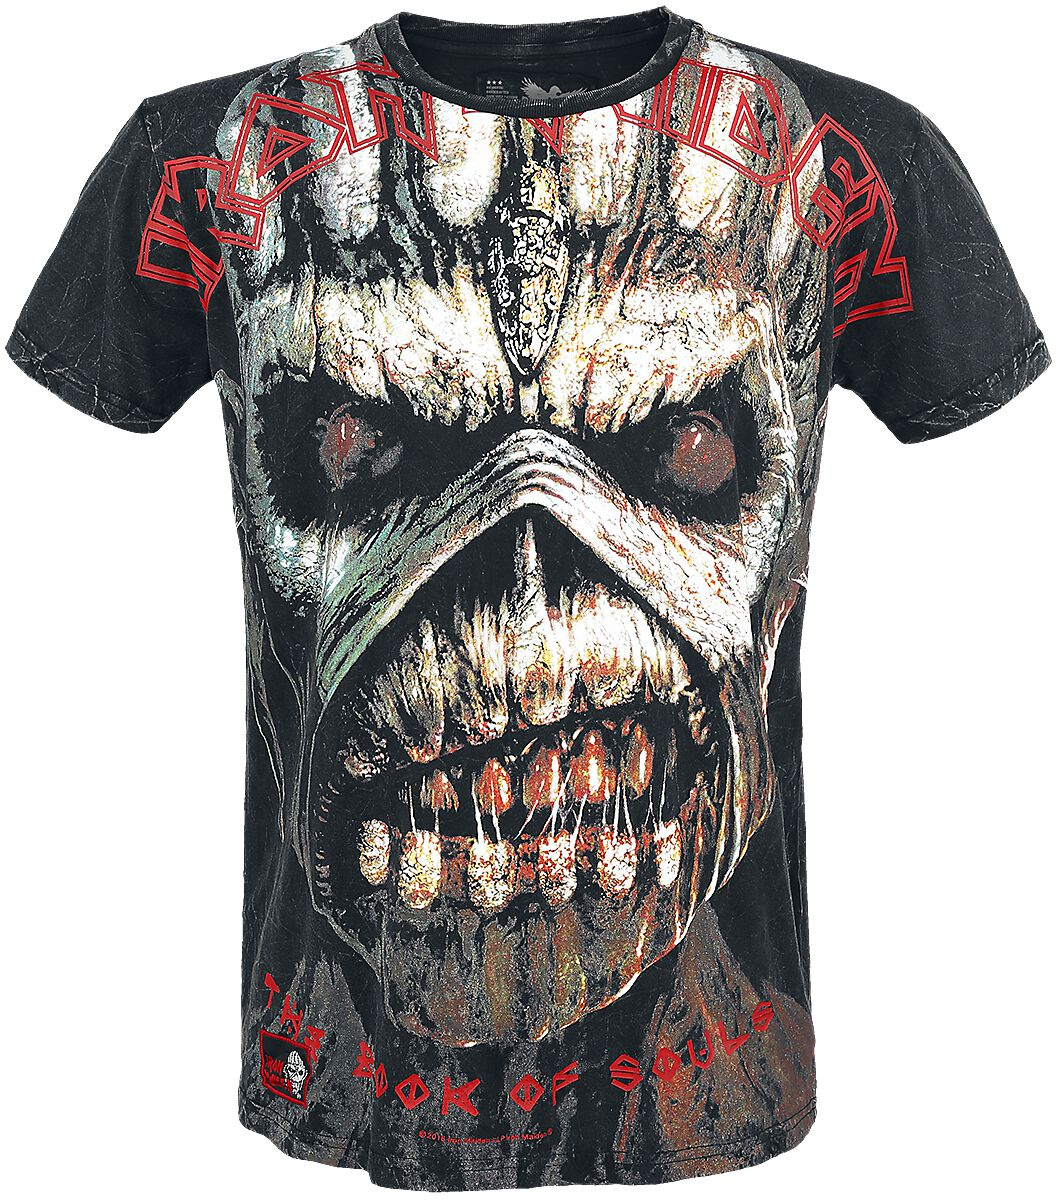 Marka własna - Koszulki - T-Shirt Iron Maiden EMP Signature Collection T-Shirt czarny - 334064